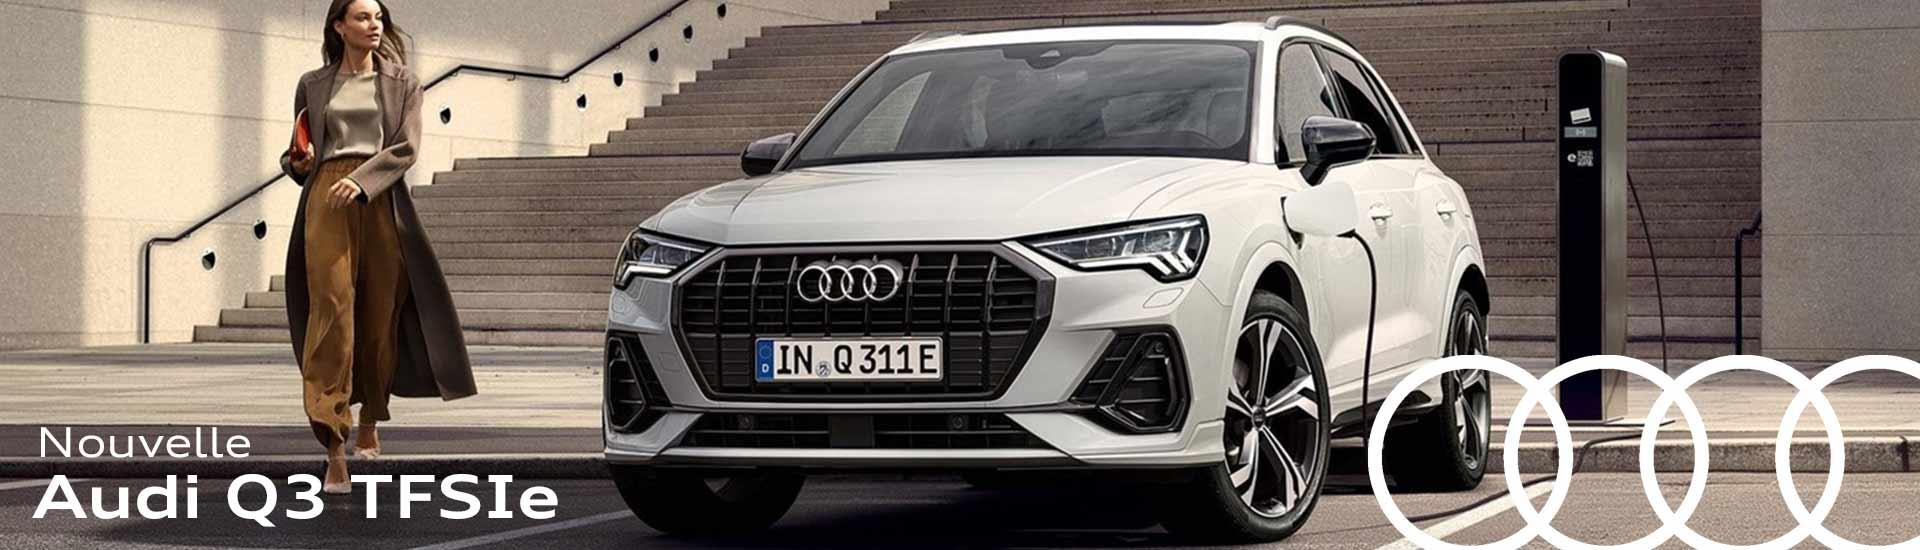 Audi Q3 TFSI e Hybride rechargeable